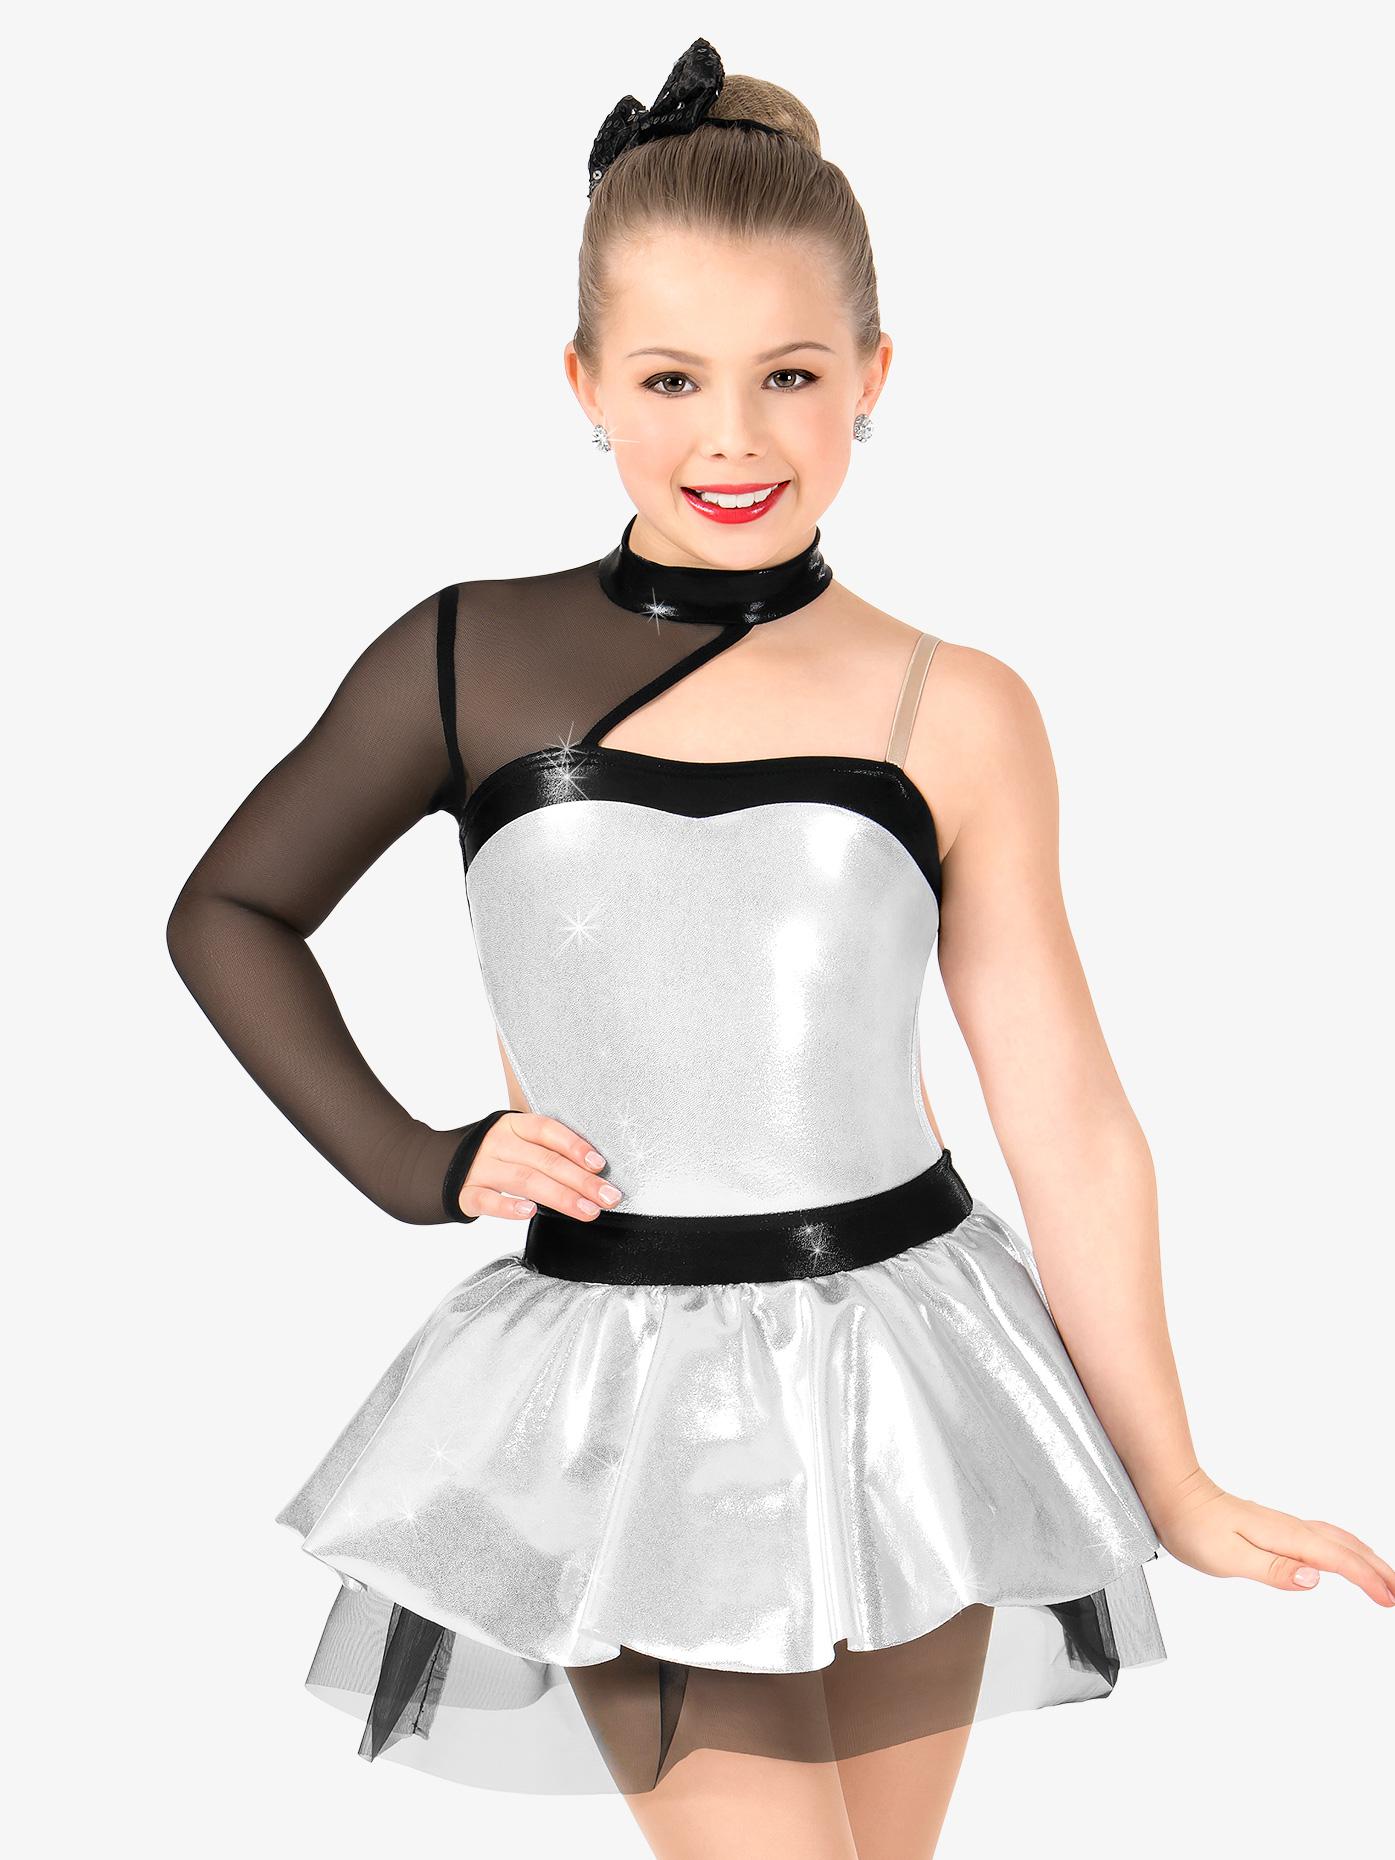 Elisse by Double Platinum Girls Metallic Asymmetrical Performance Tutu Dress N7463C